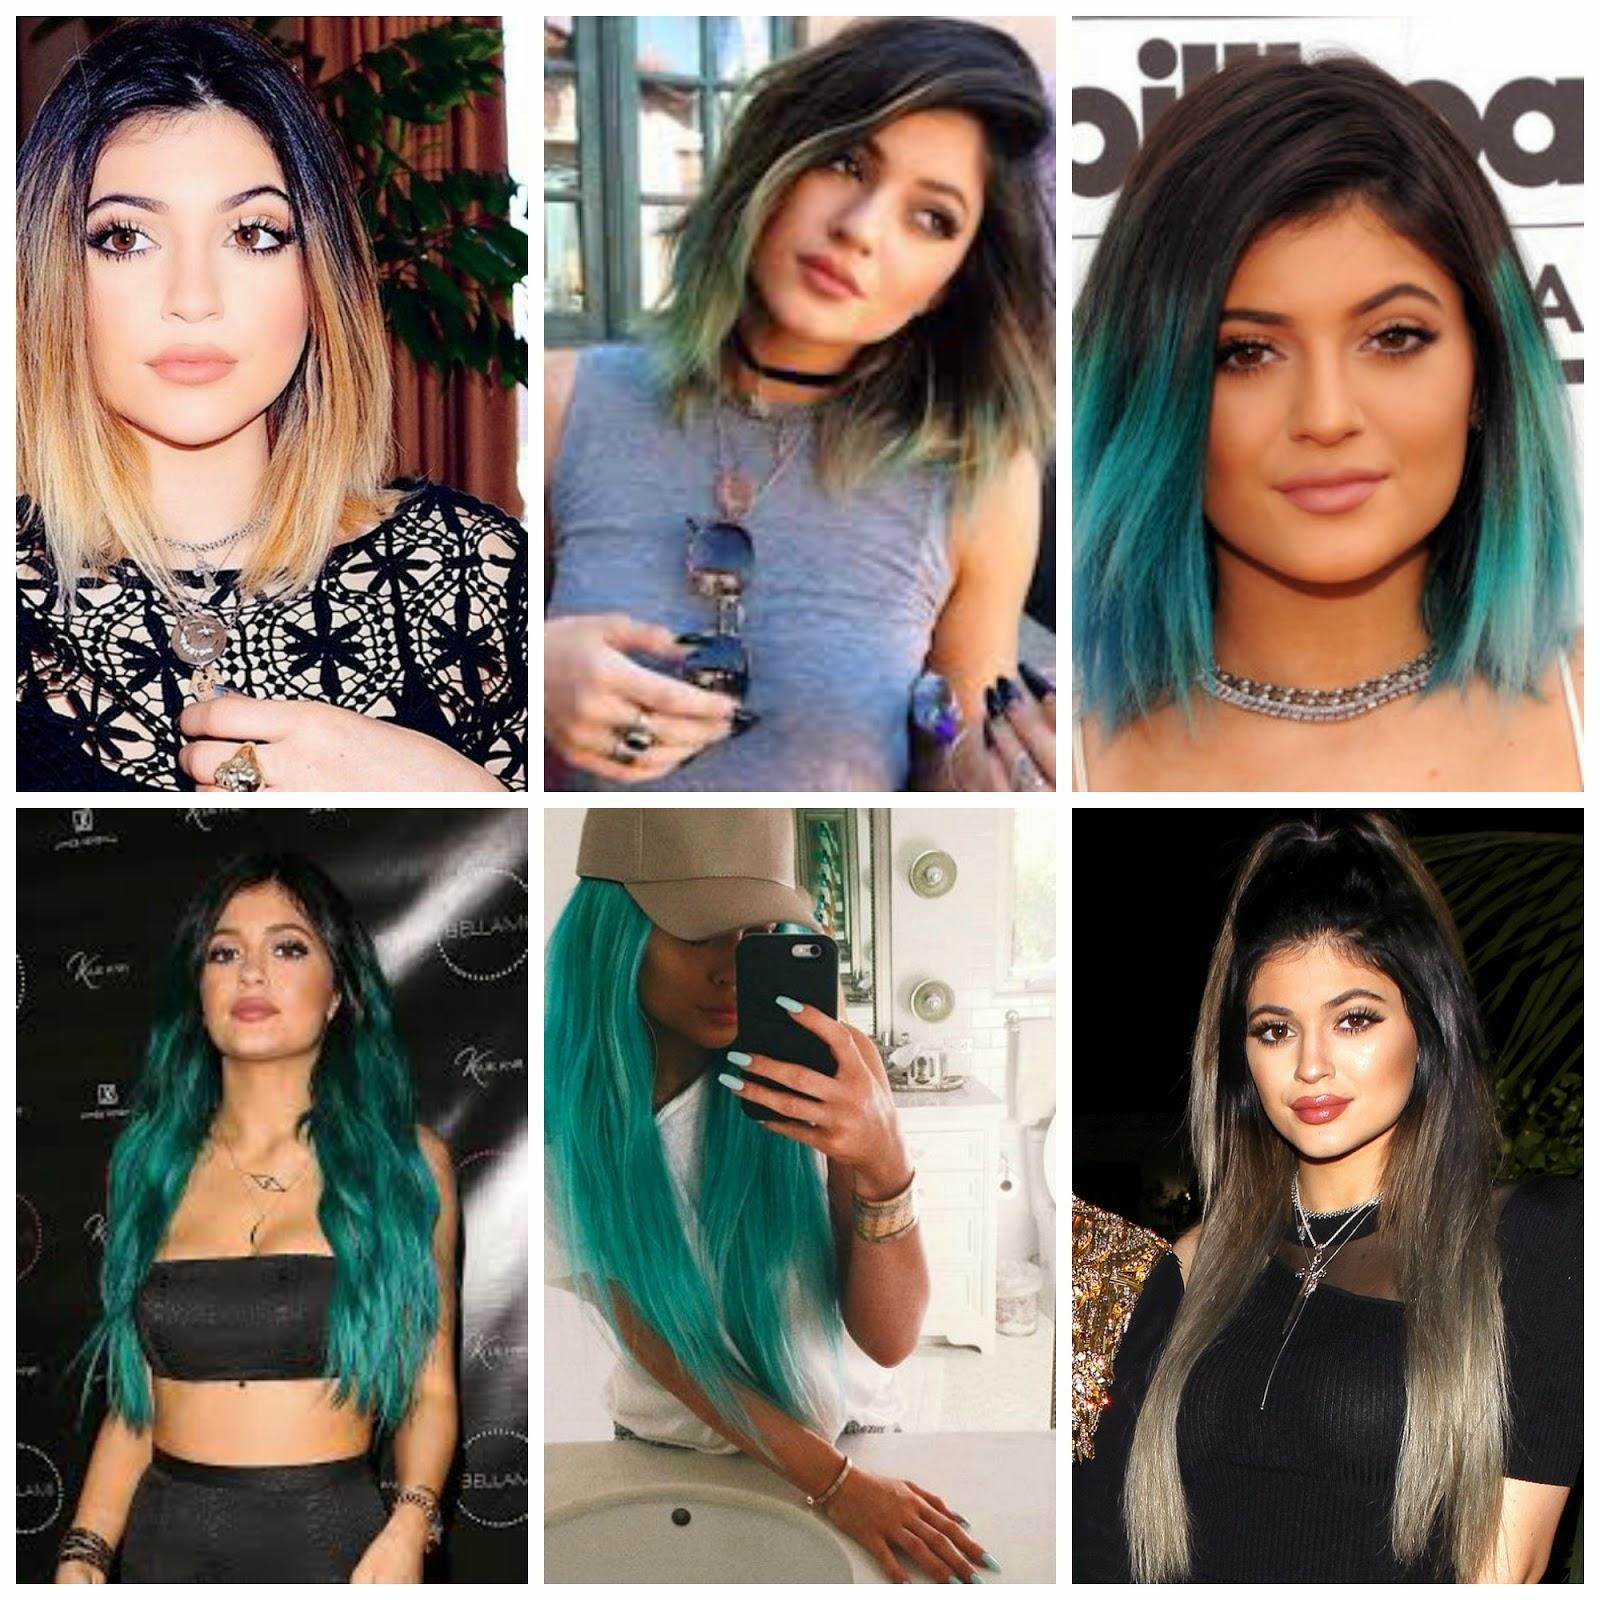 Kylie Jenners Hair | Celebrity